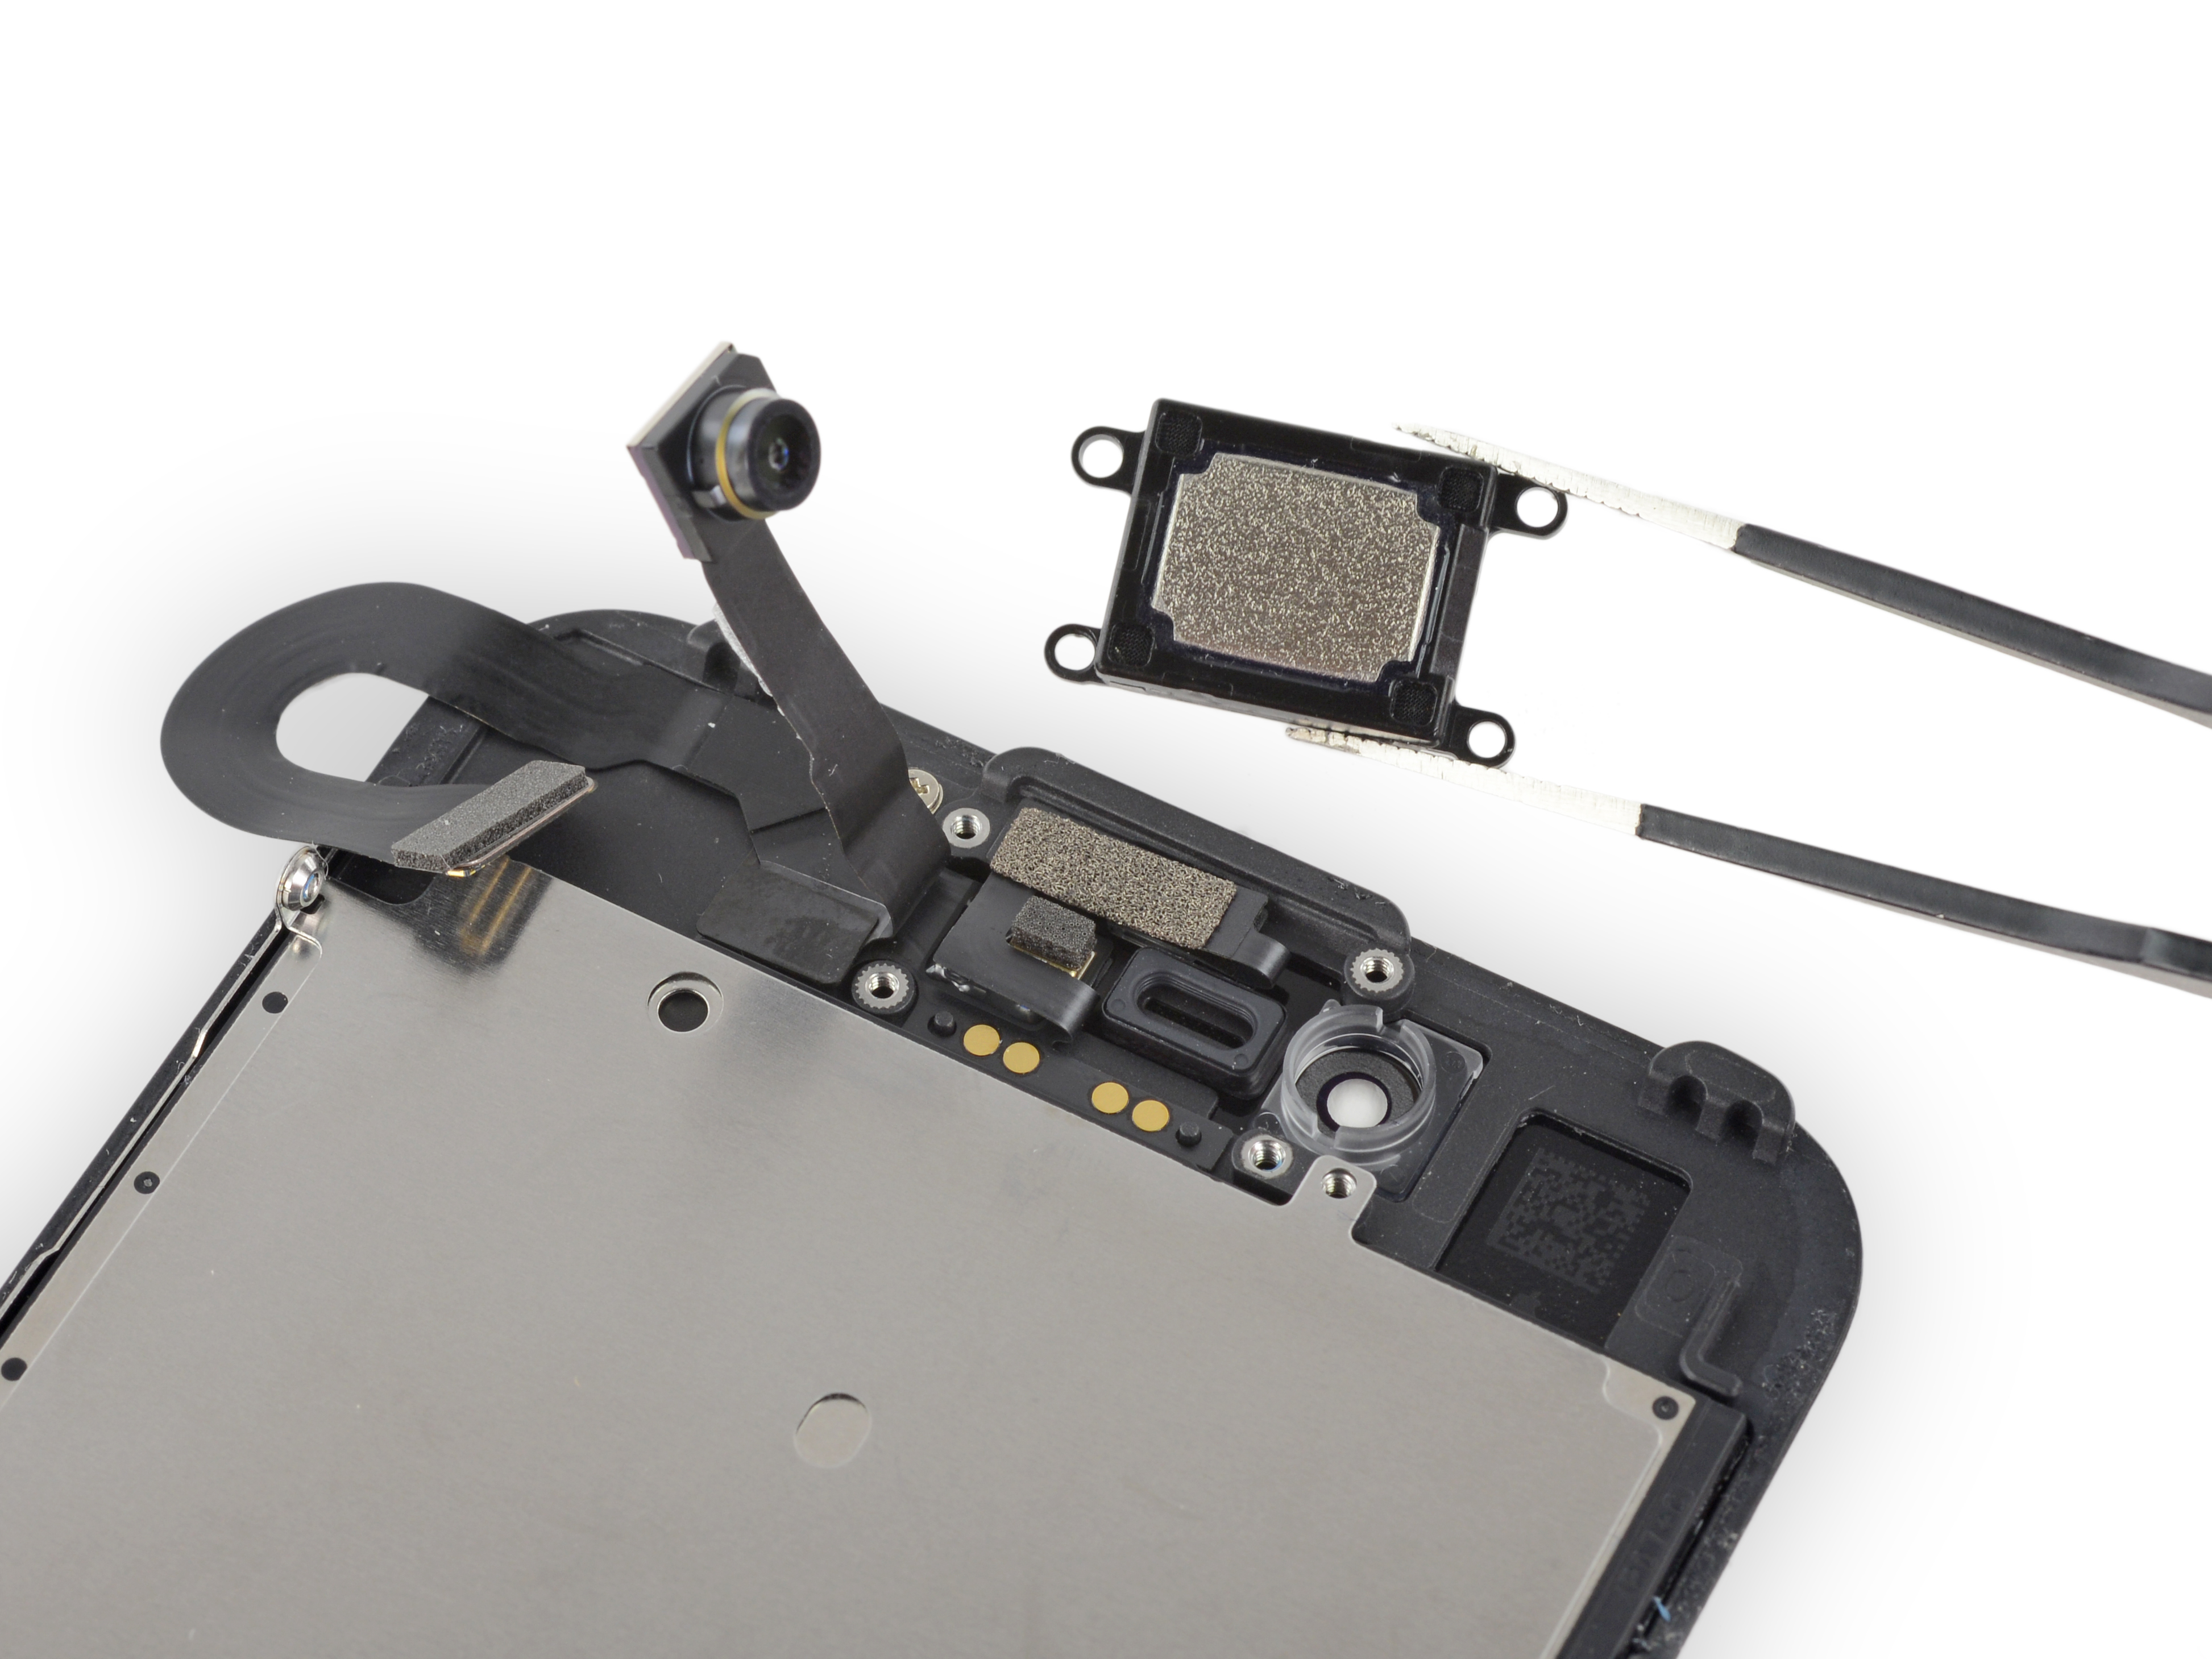 Iphone 7 Earpiece Speaker Replacement Ifixit Repair Guide